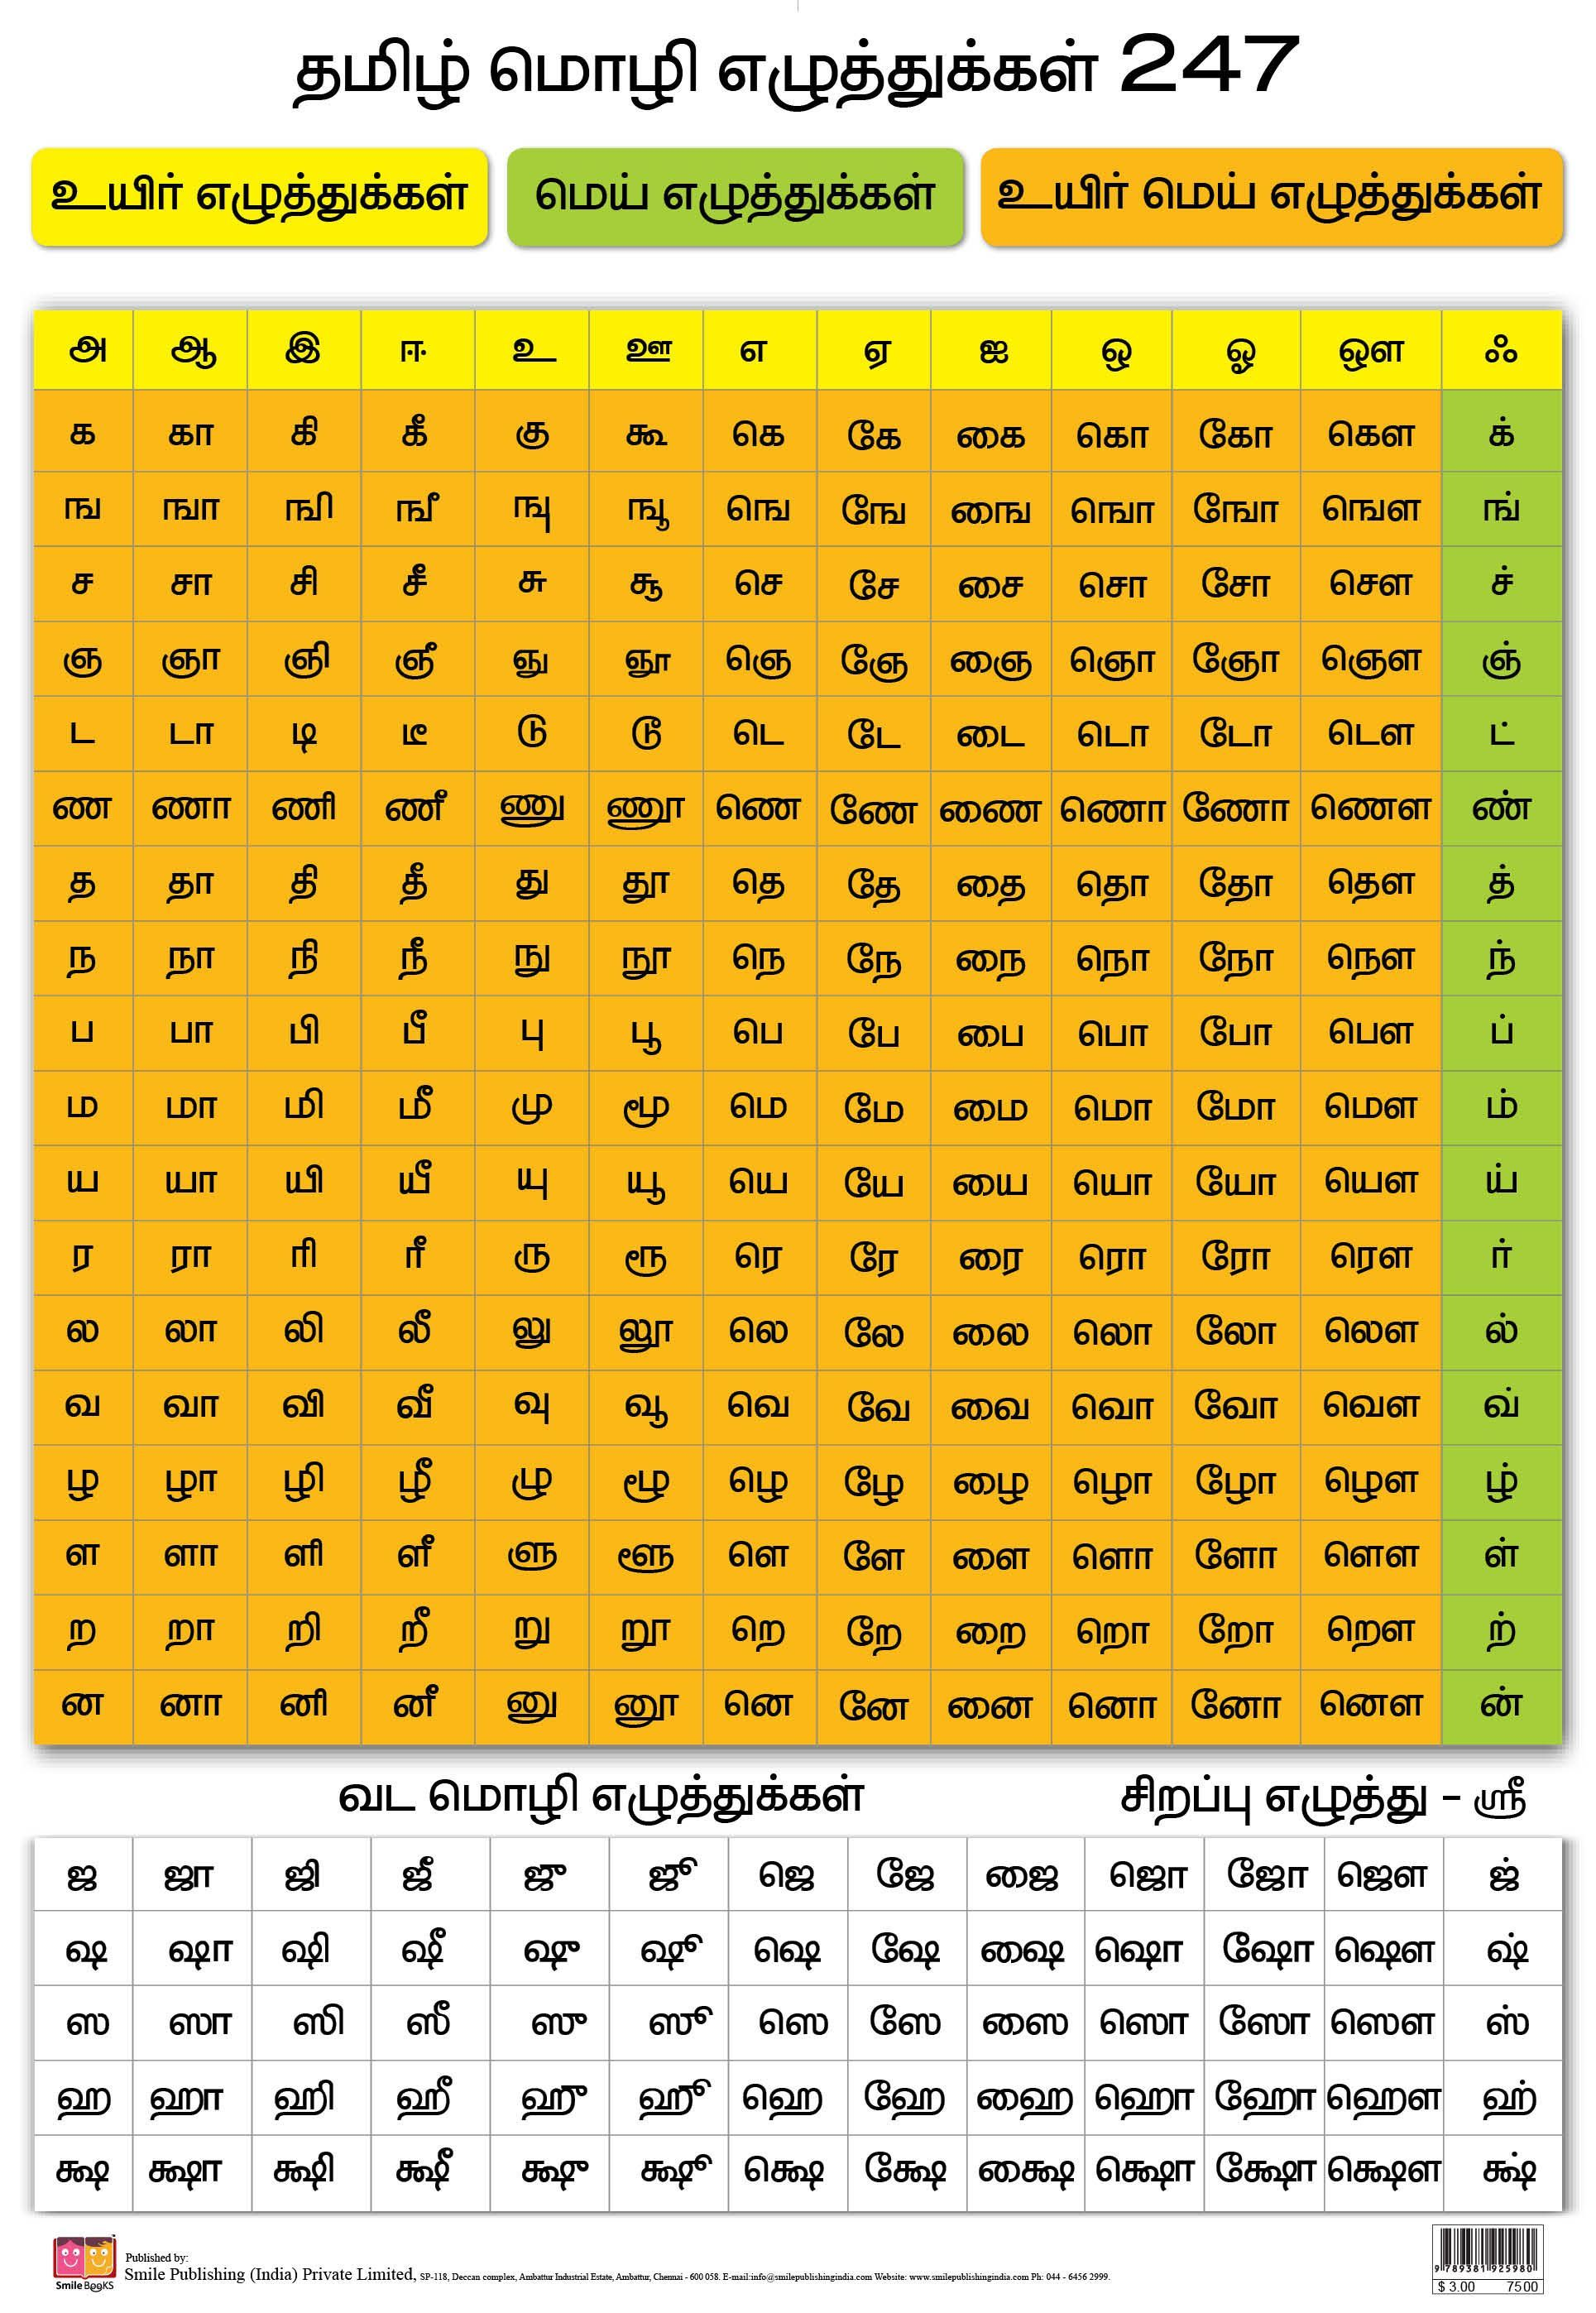 Tamil Phonology International Phonetic Alphabet Tamil